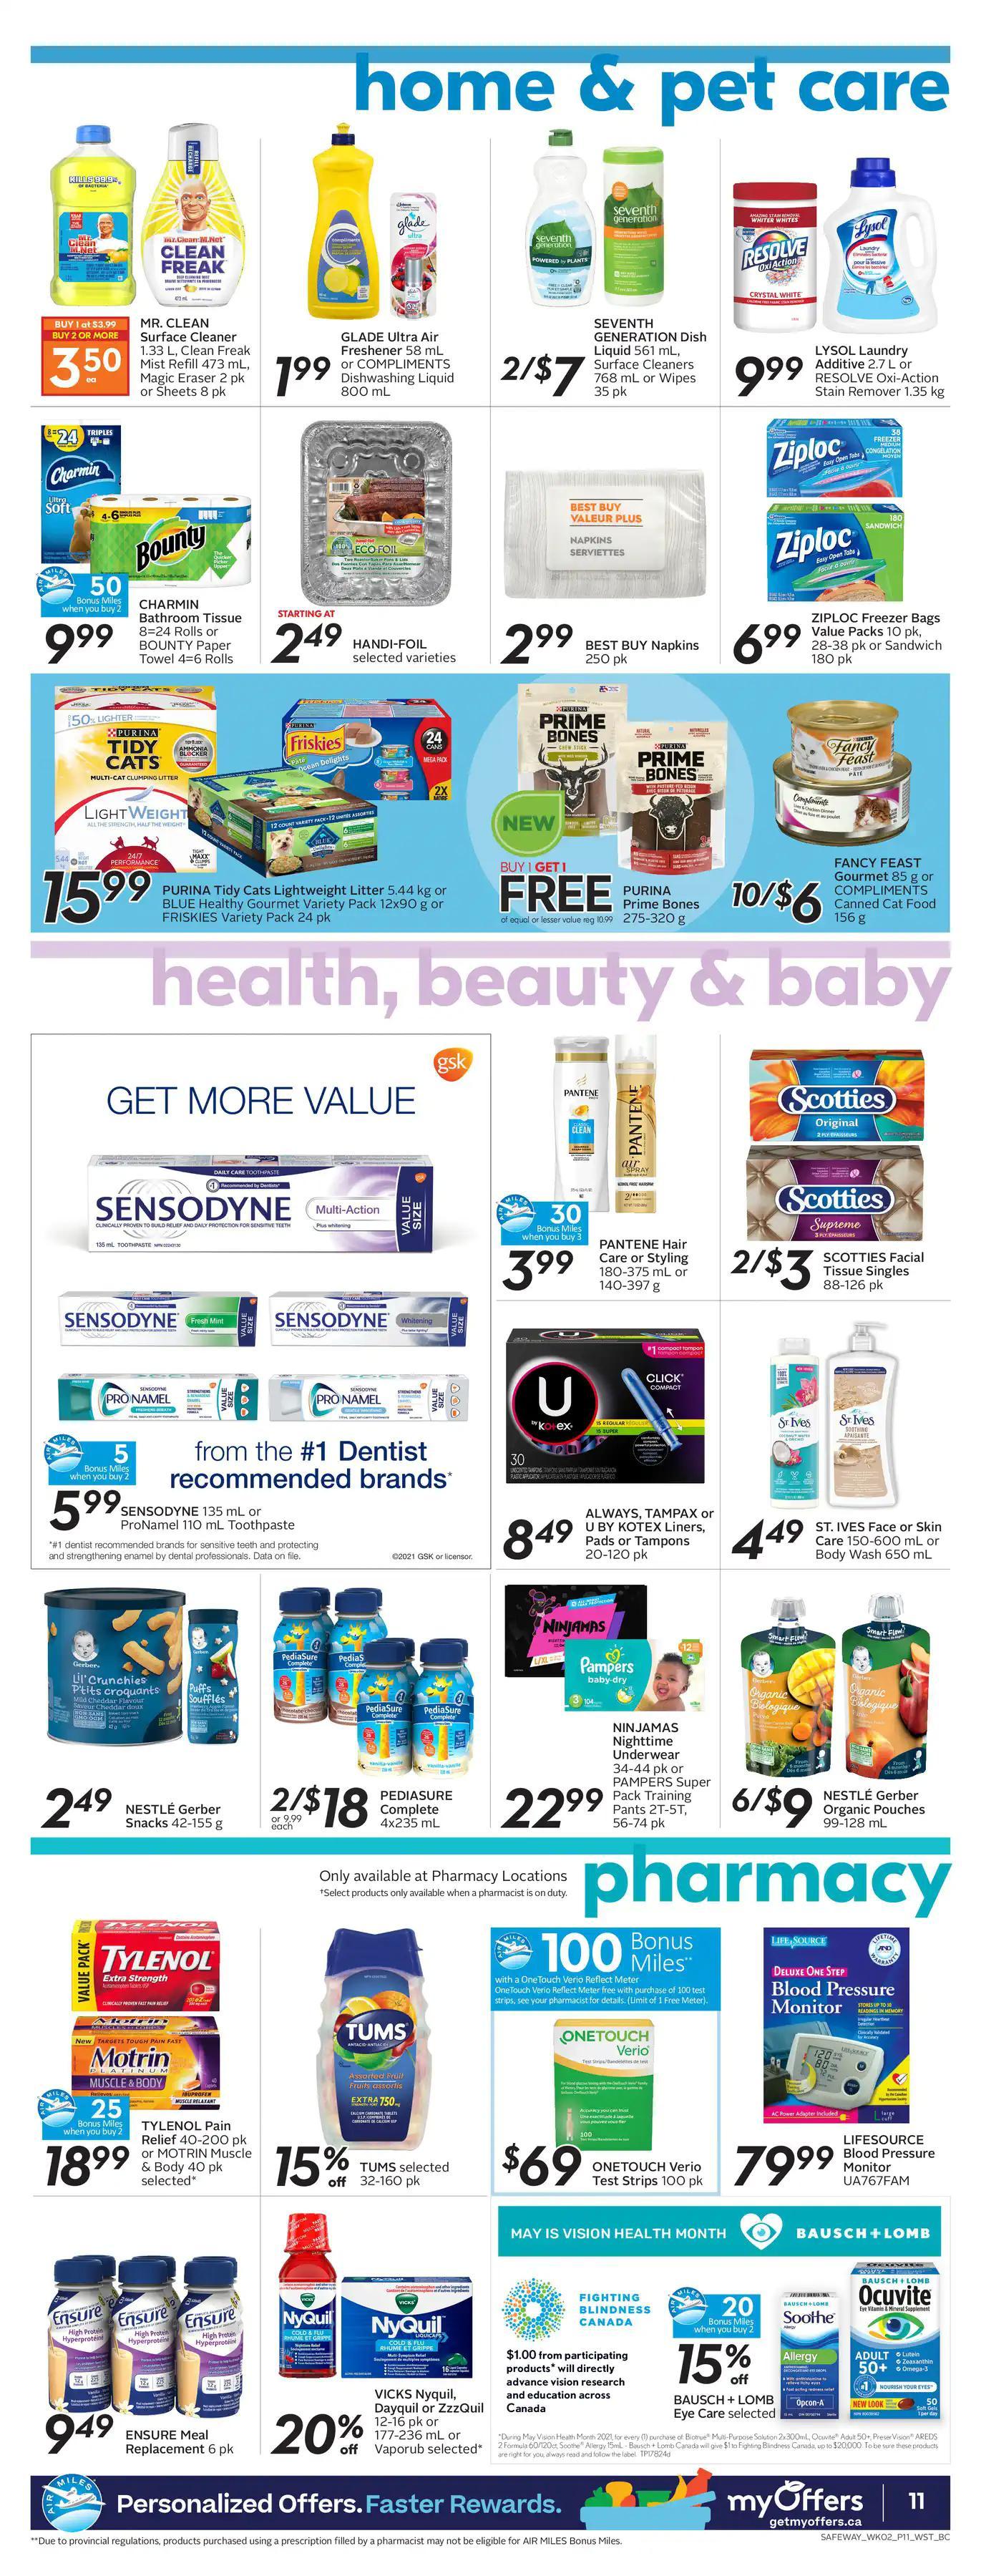 Safeway - Weekly Flyer Specials - Page 12